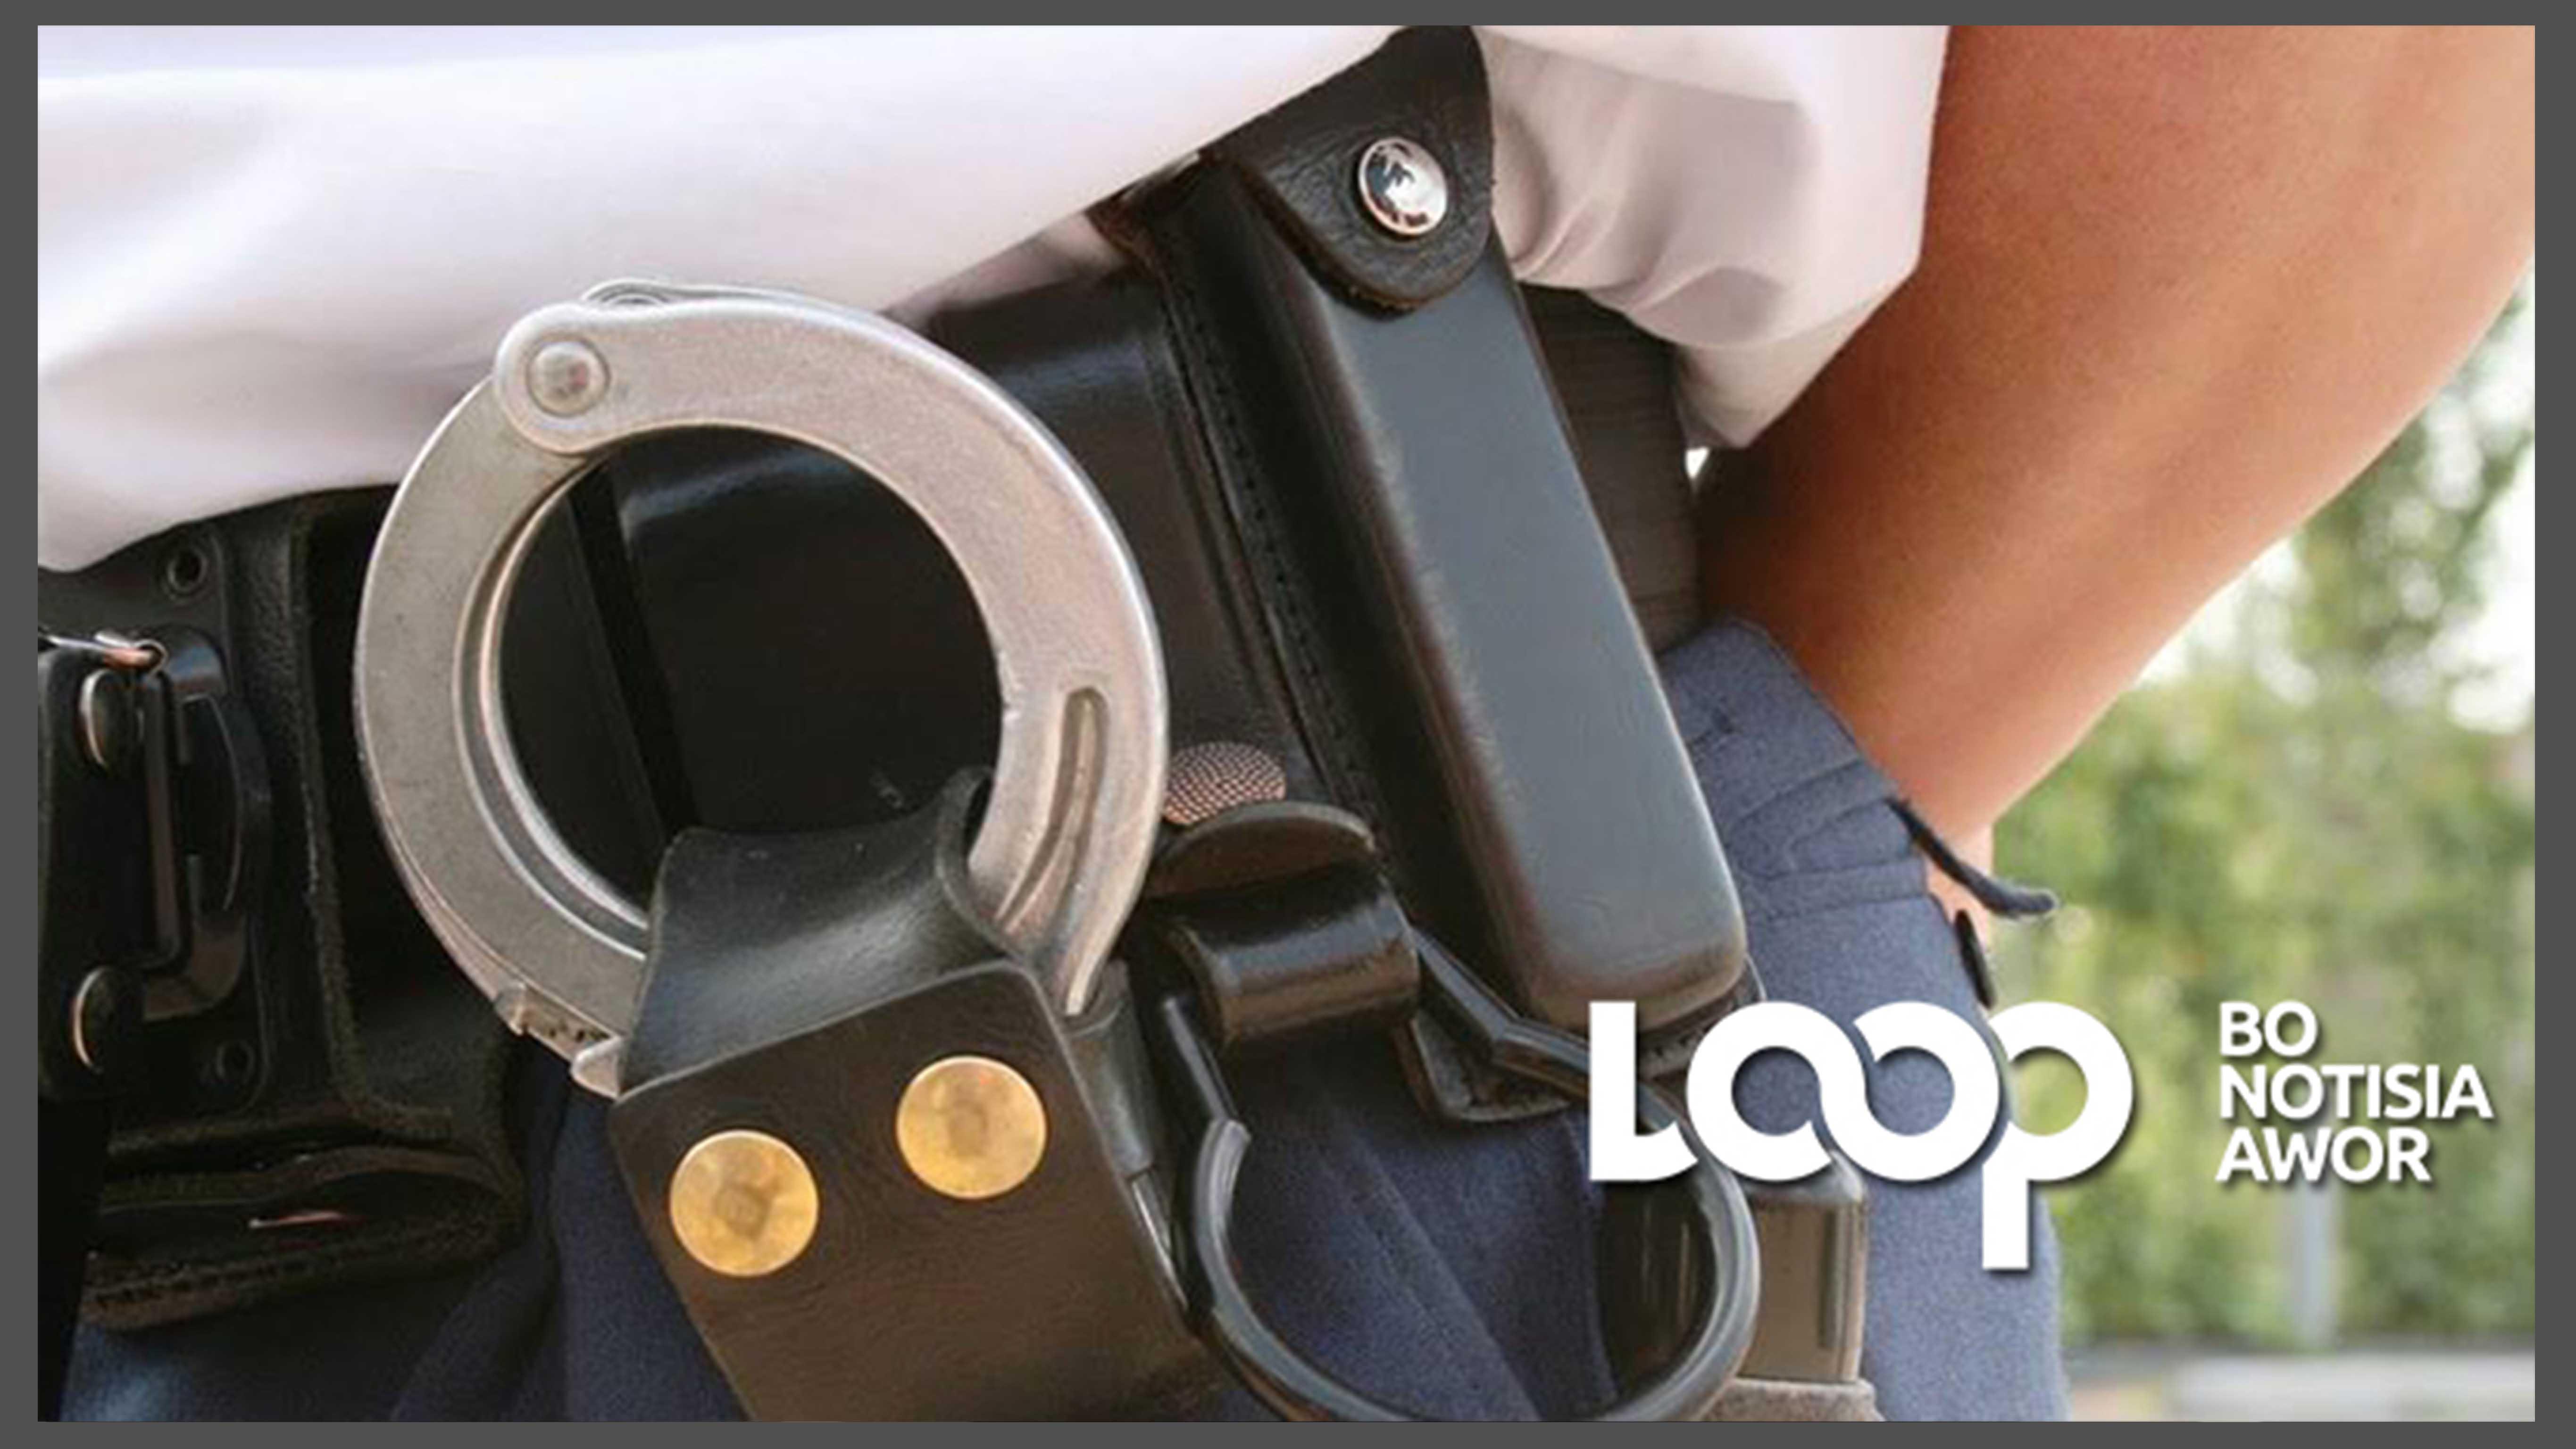 Polis a detené un hòmber sospechoso pa ladronisia di outo.